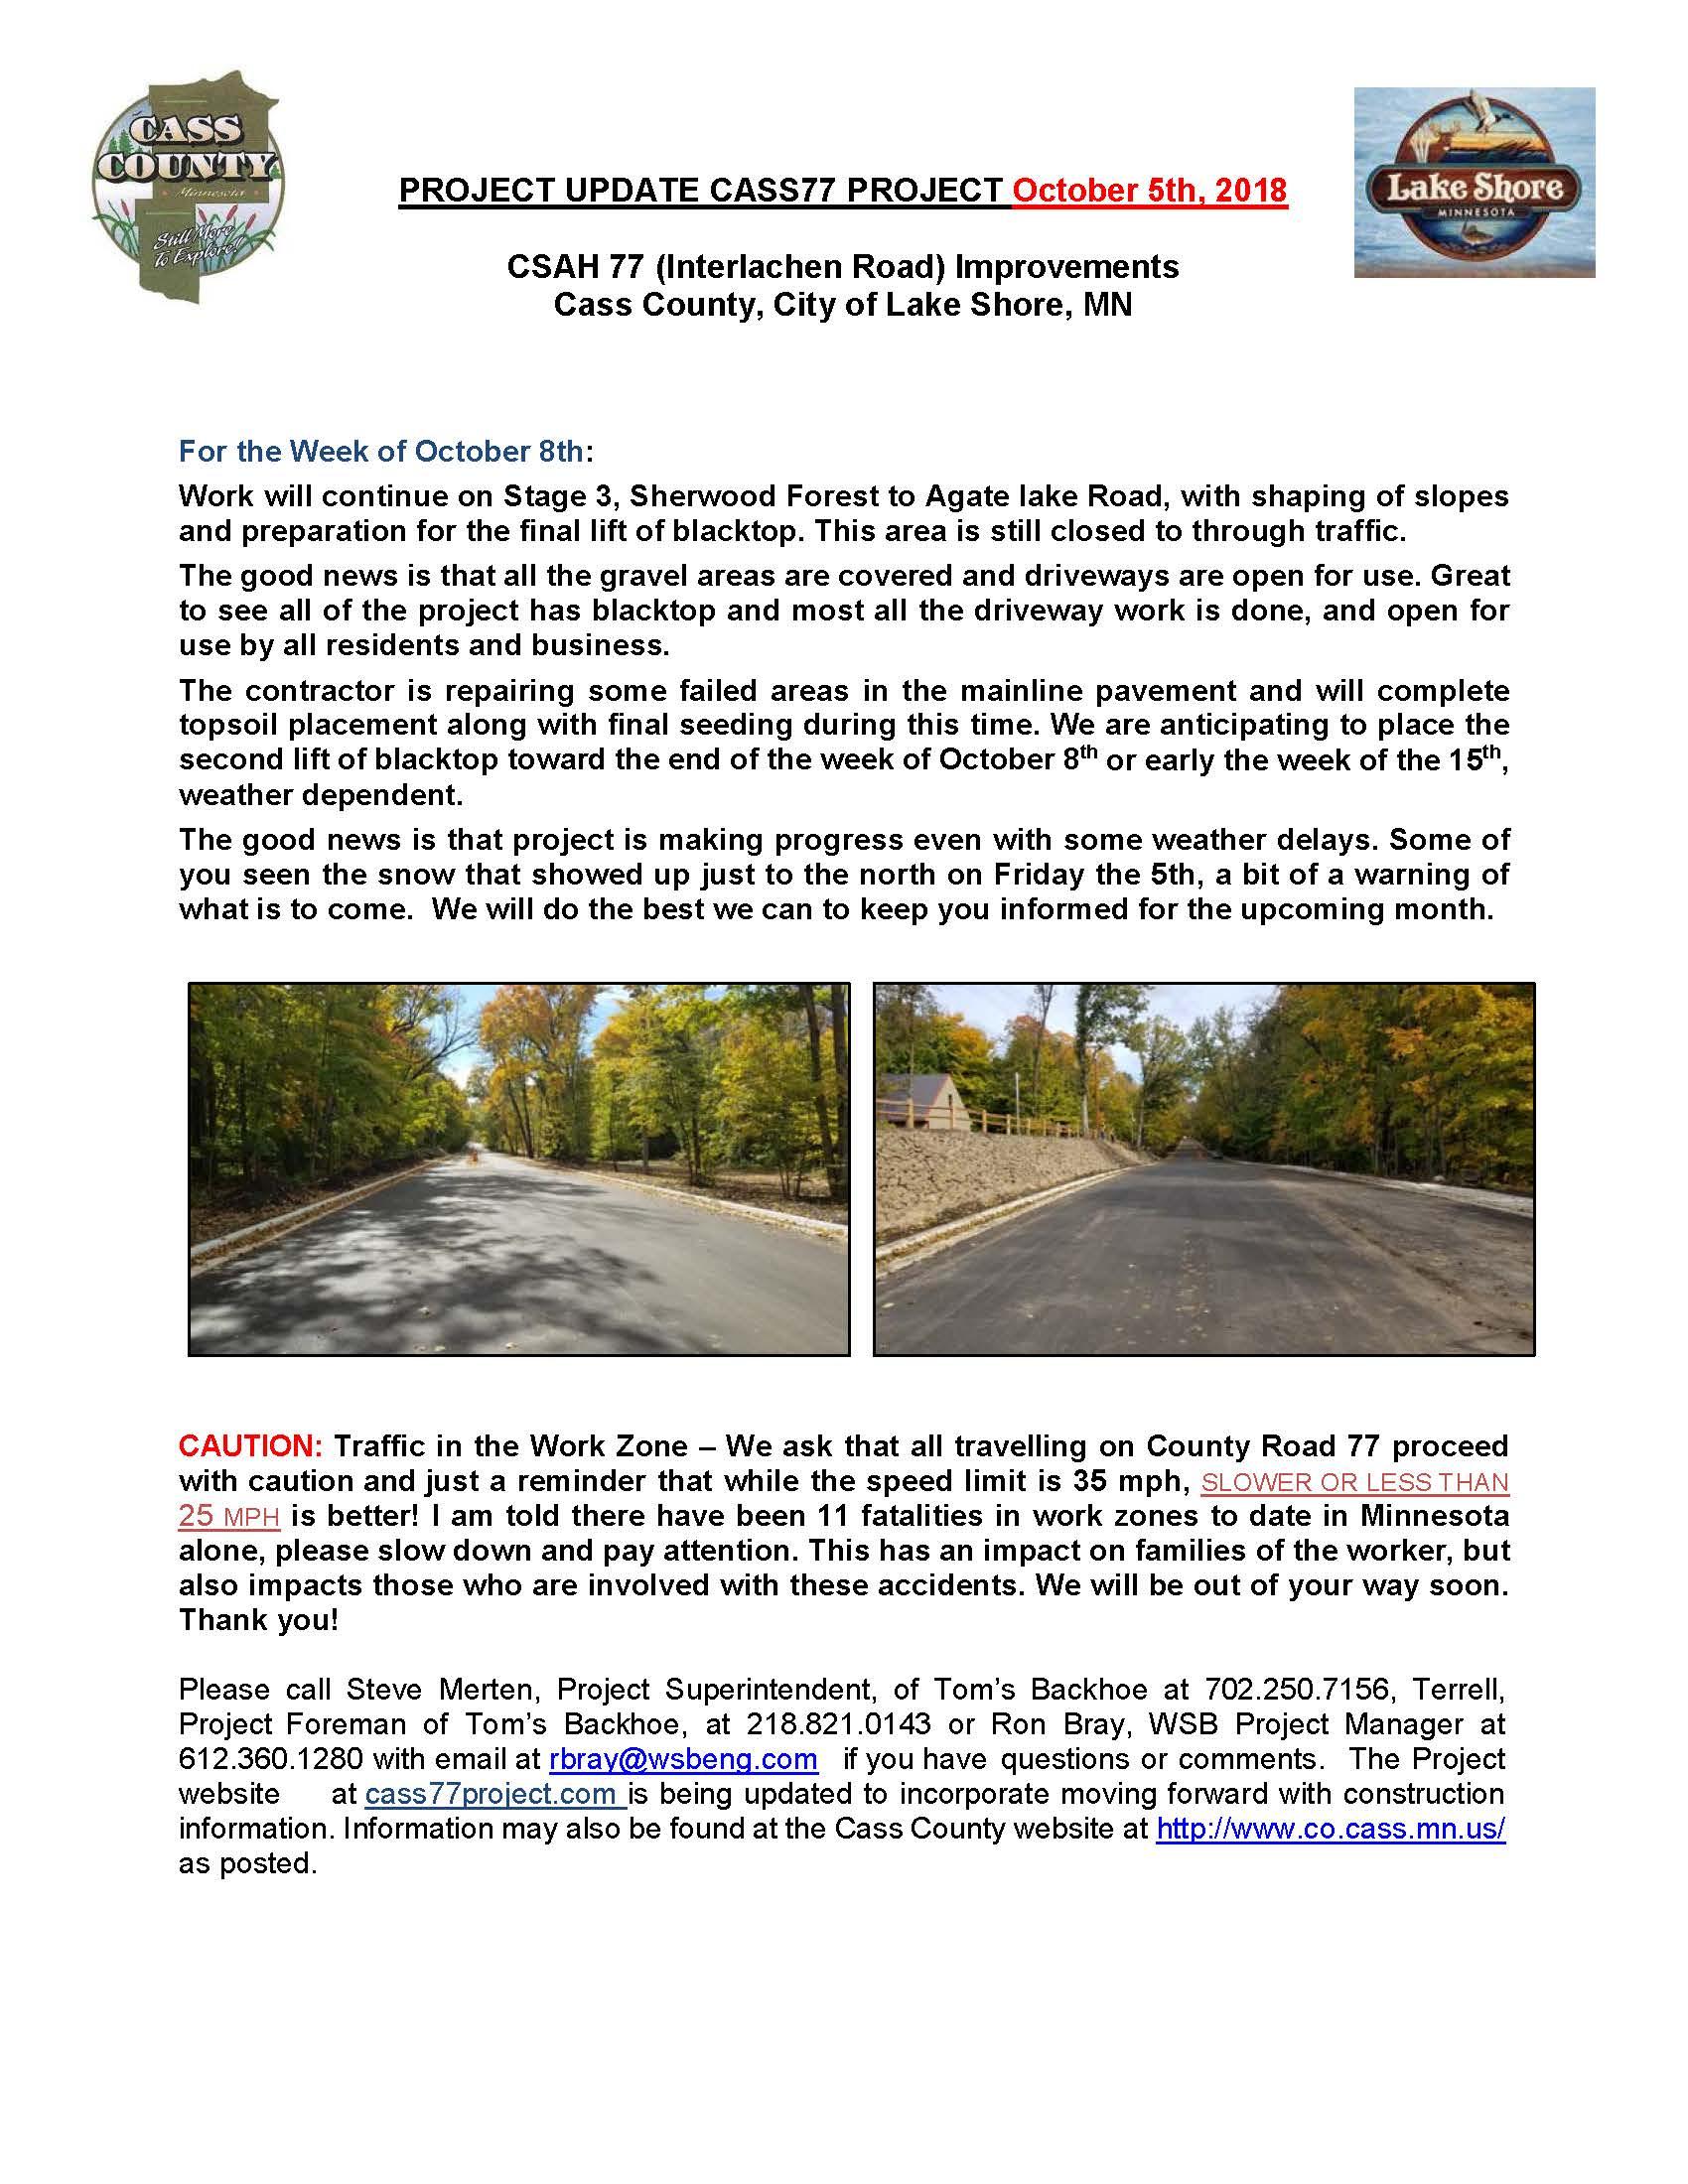 Cass County CSAH 77 Project update October 5th 2018.jpg